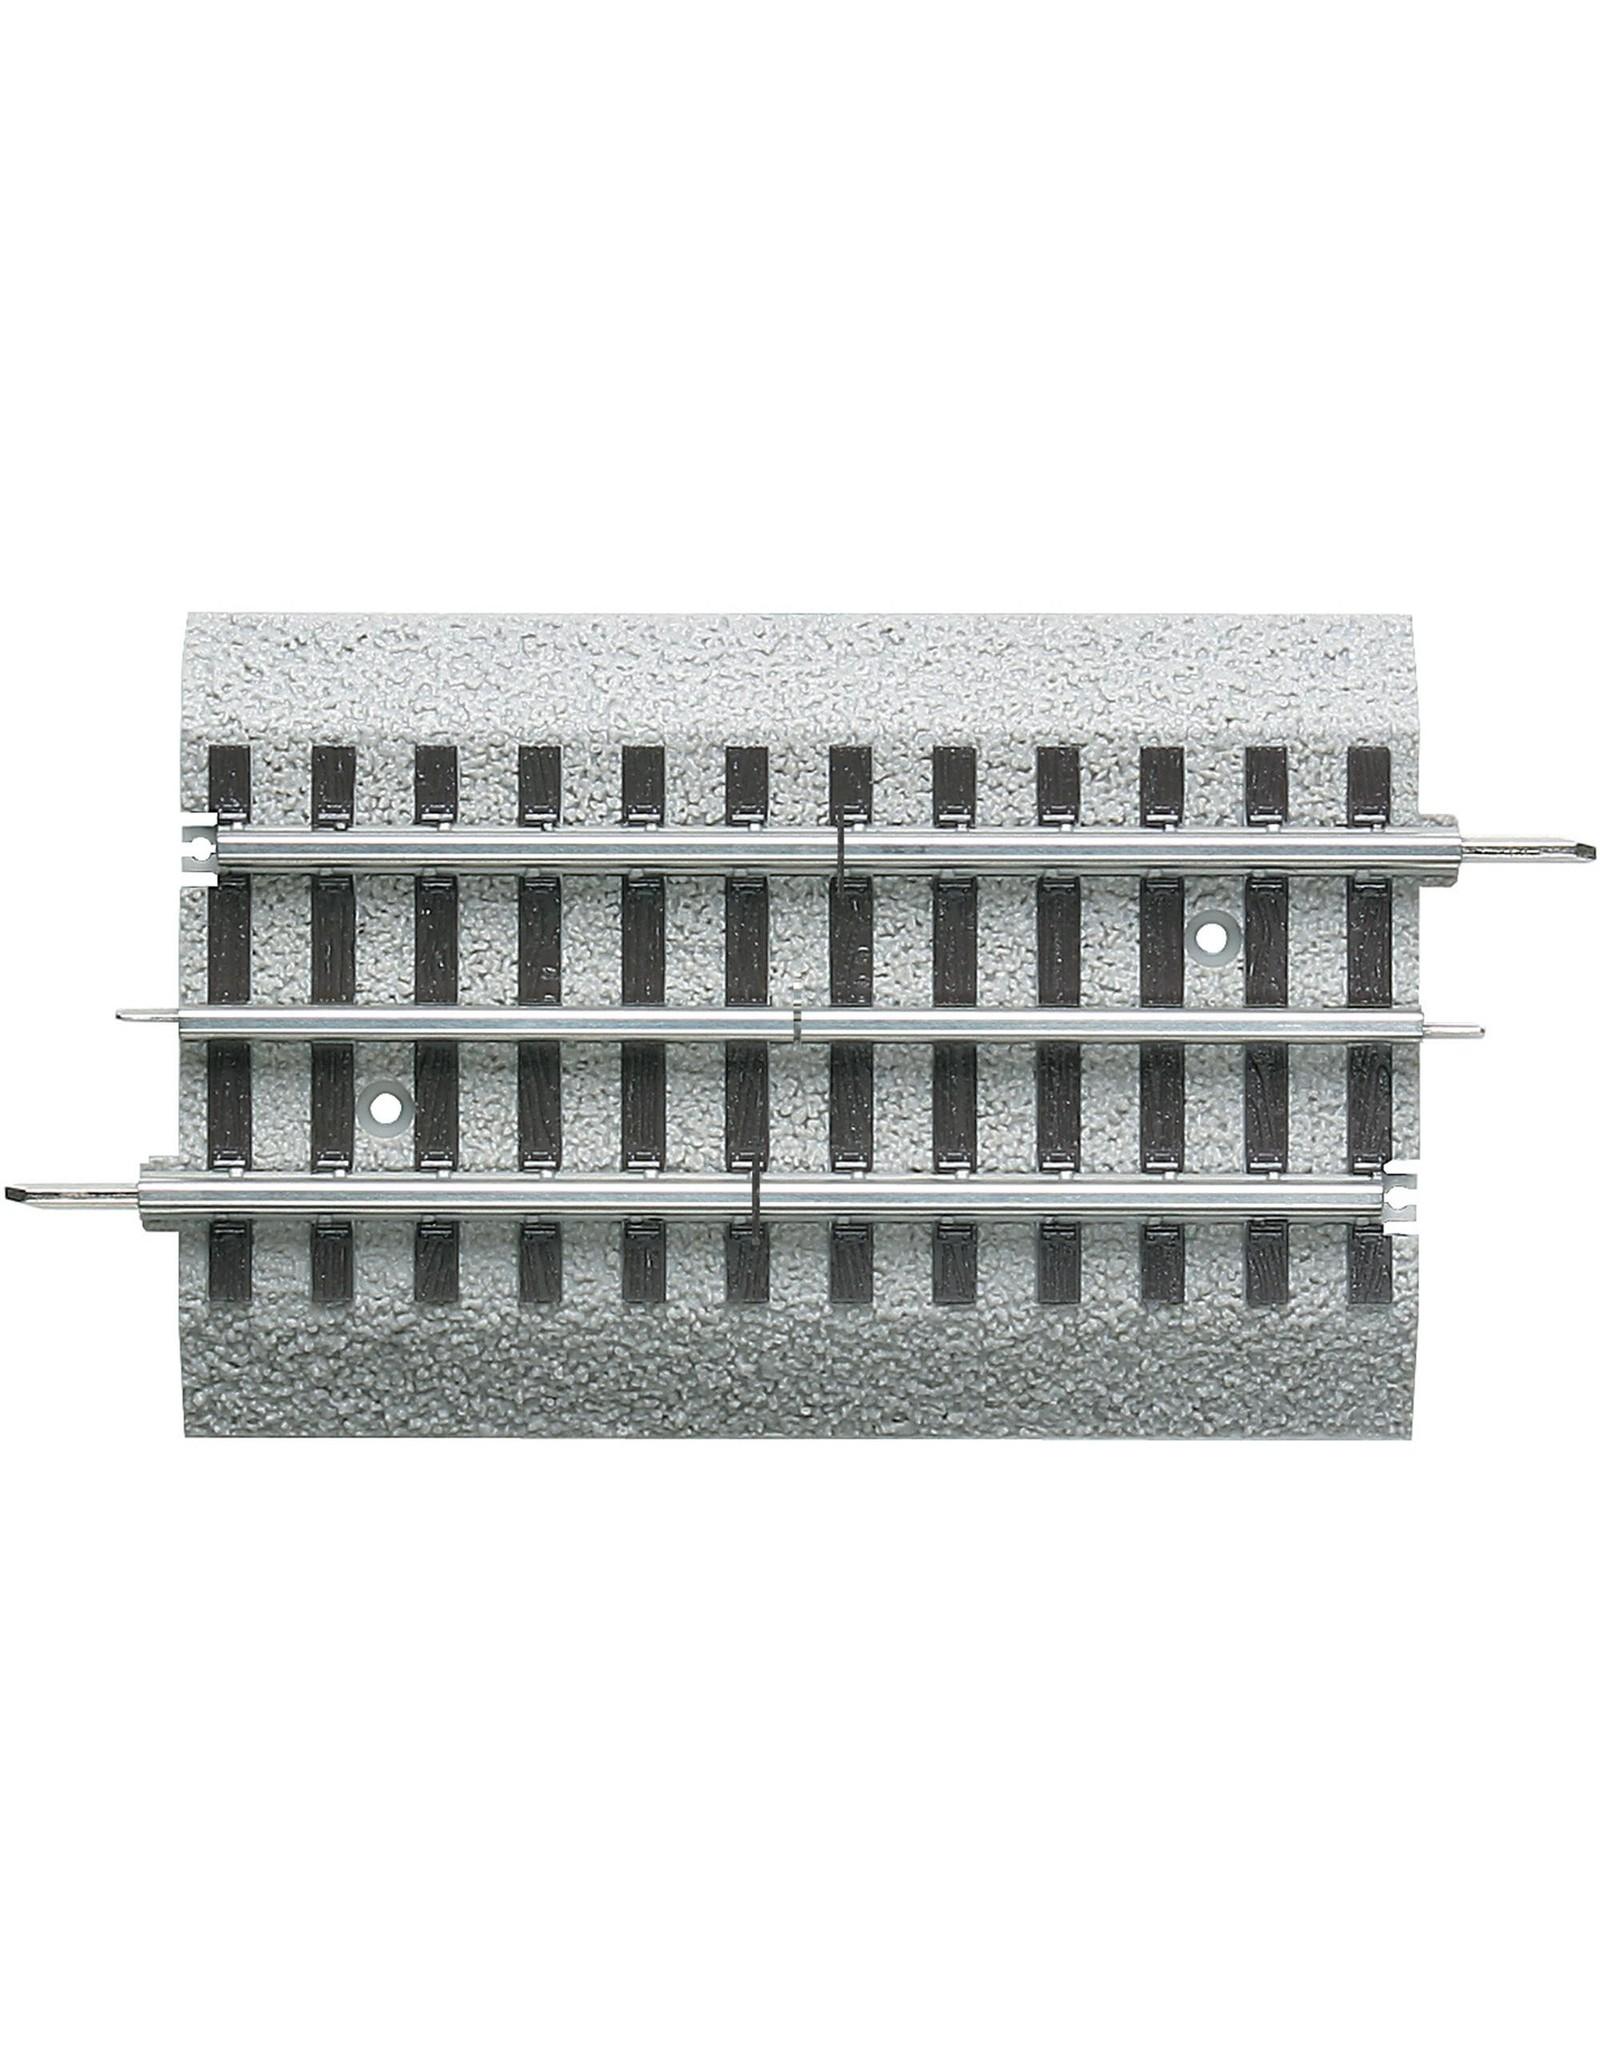 Lionel Lionel Fastrack Block Section47-00000 6-12060